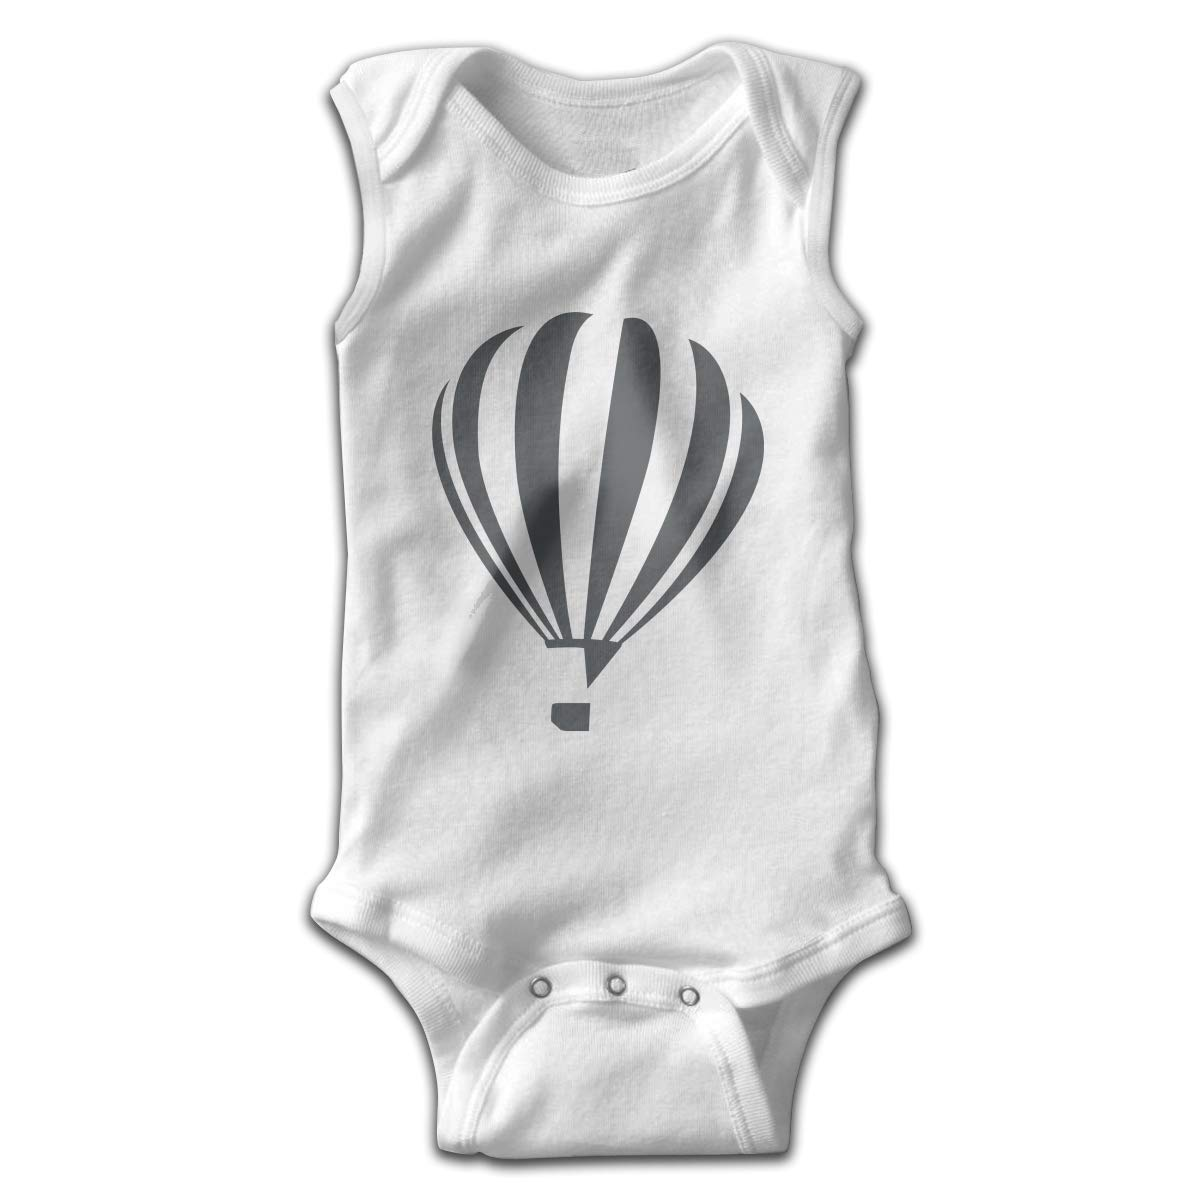 Newborn Baby Girls Rompers Sleeveless Cotton Onesie,Hot Air Balloon Bodysuit Summer Pajamas